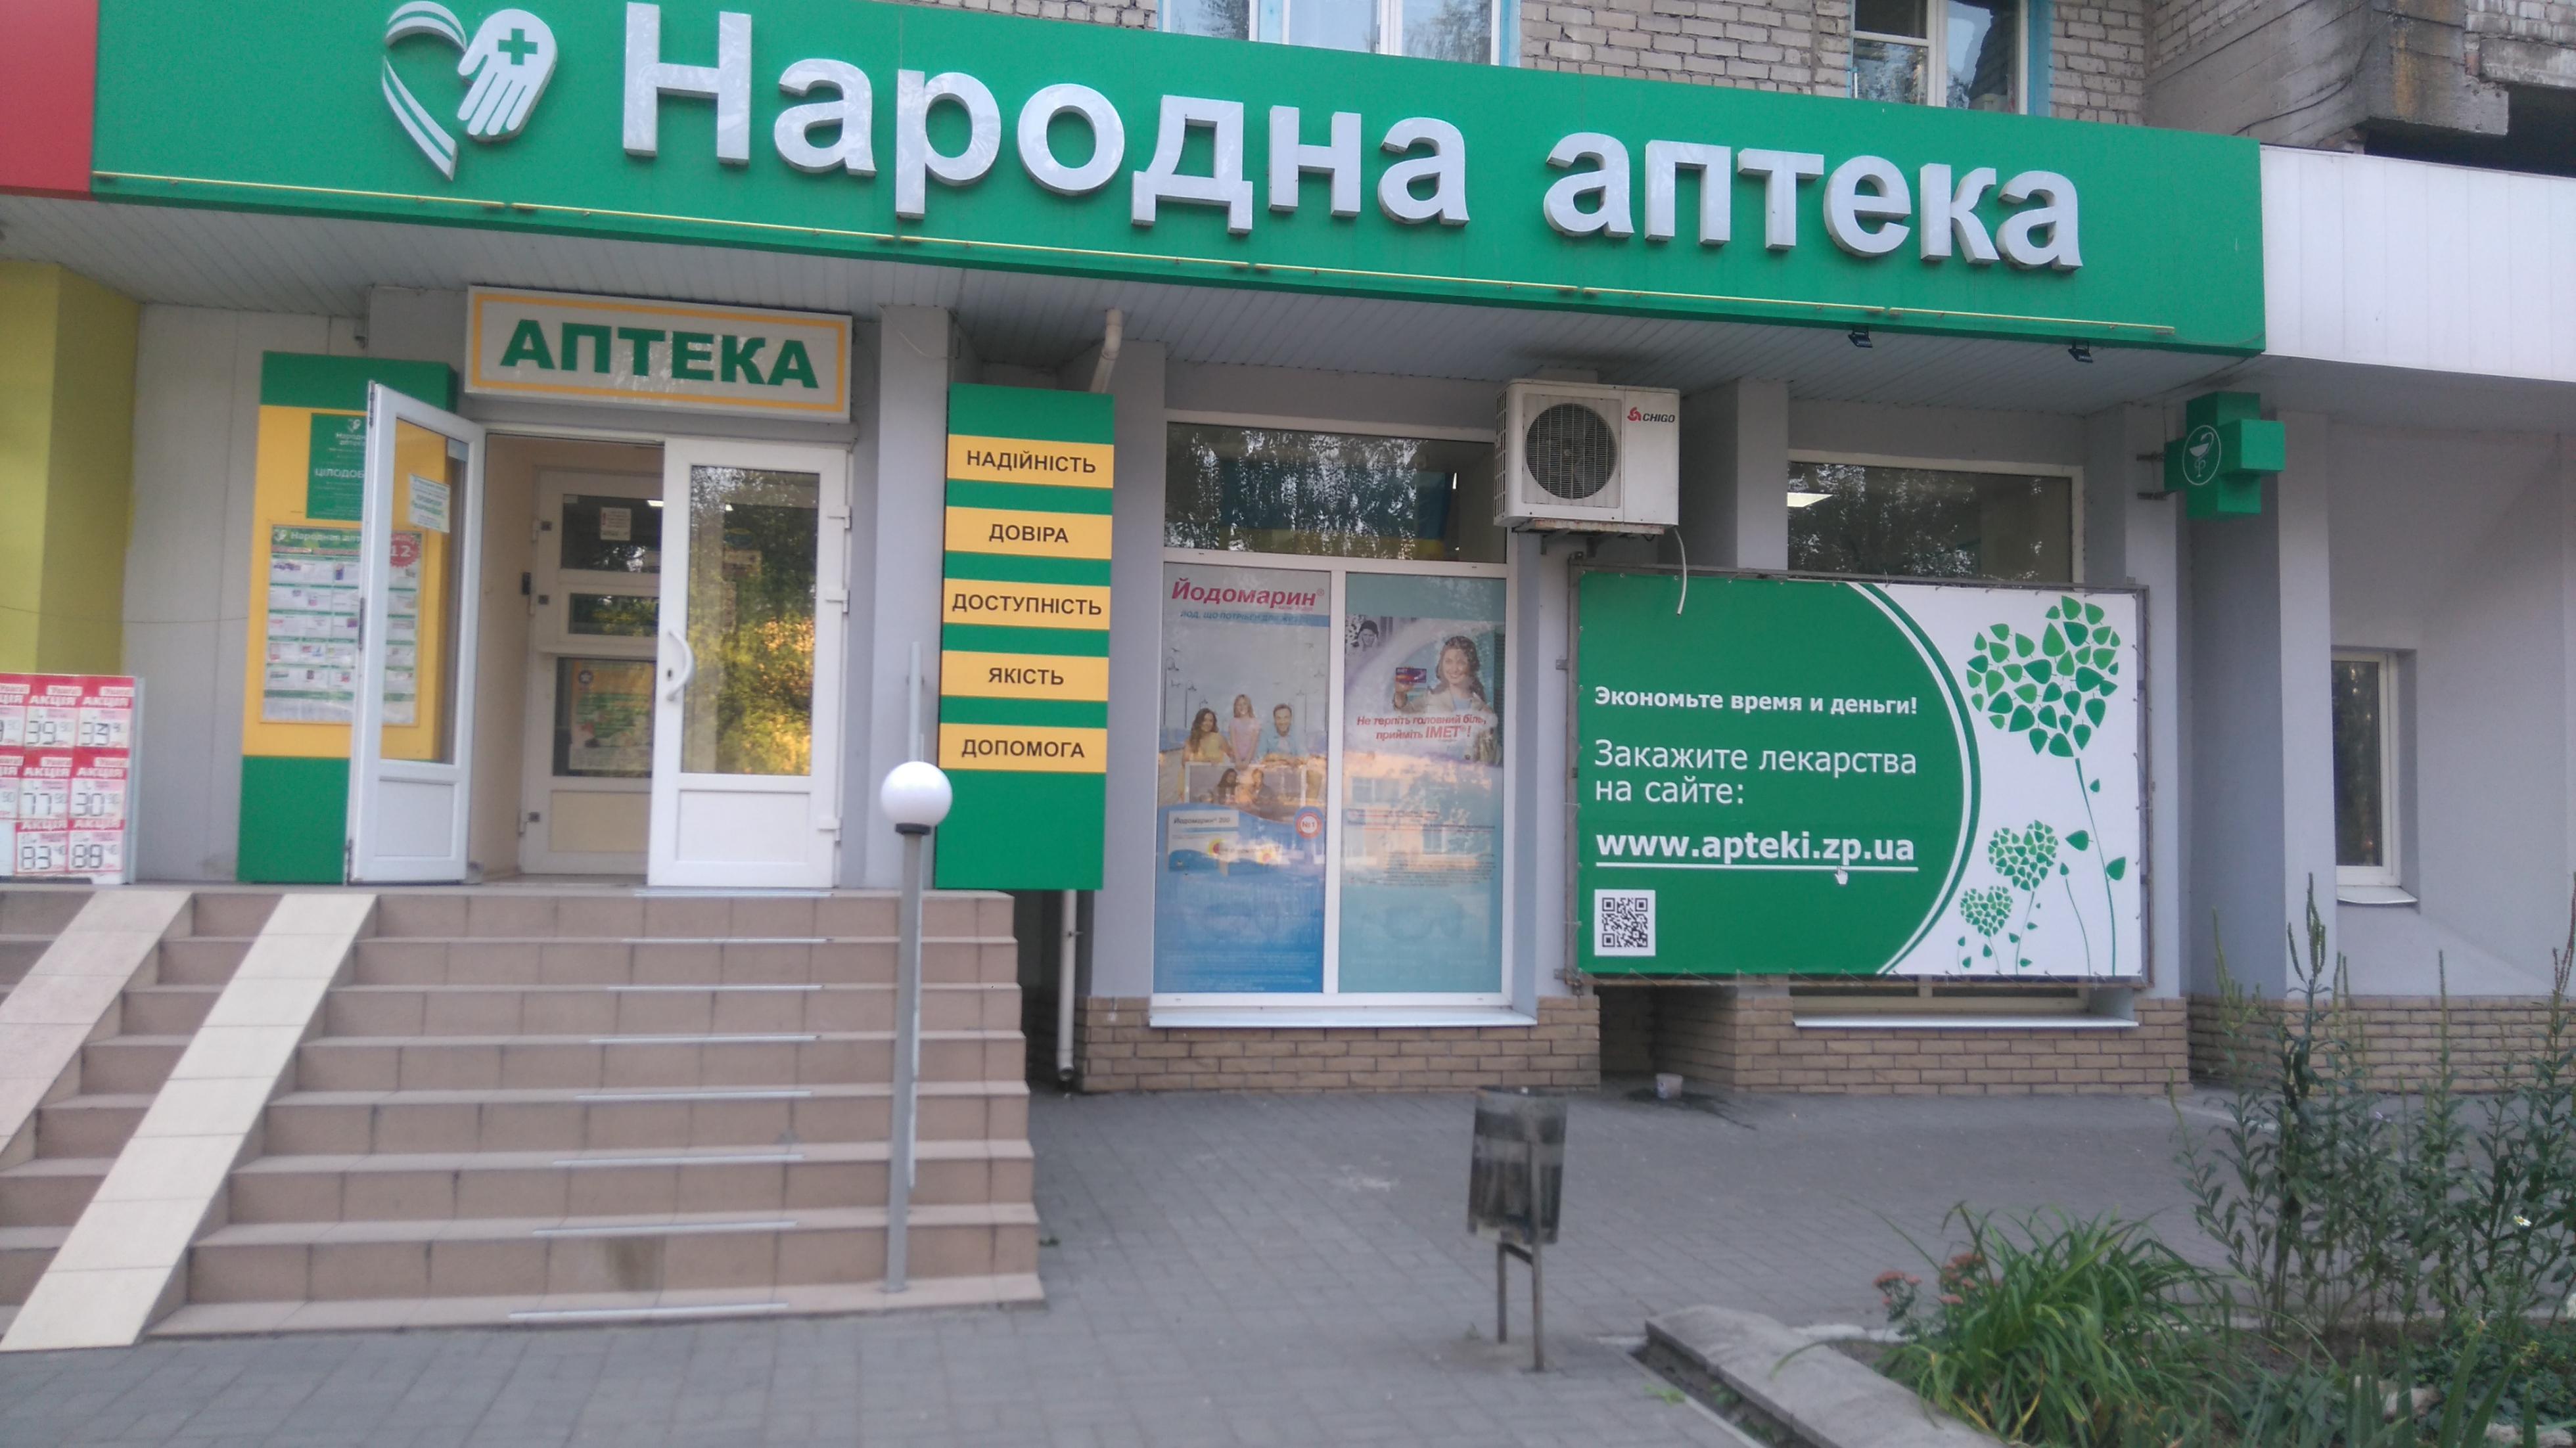 Картинки по запросу apteki.zp.ua